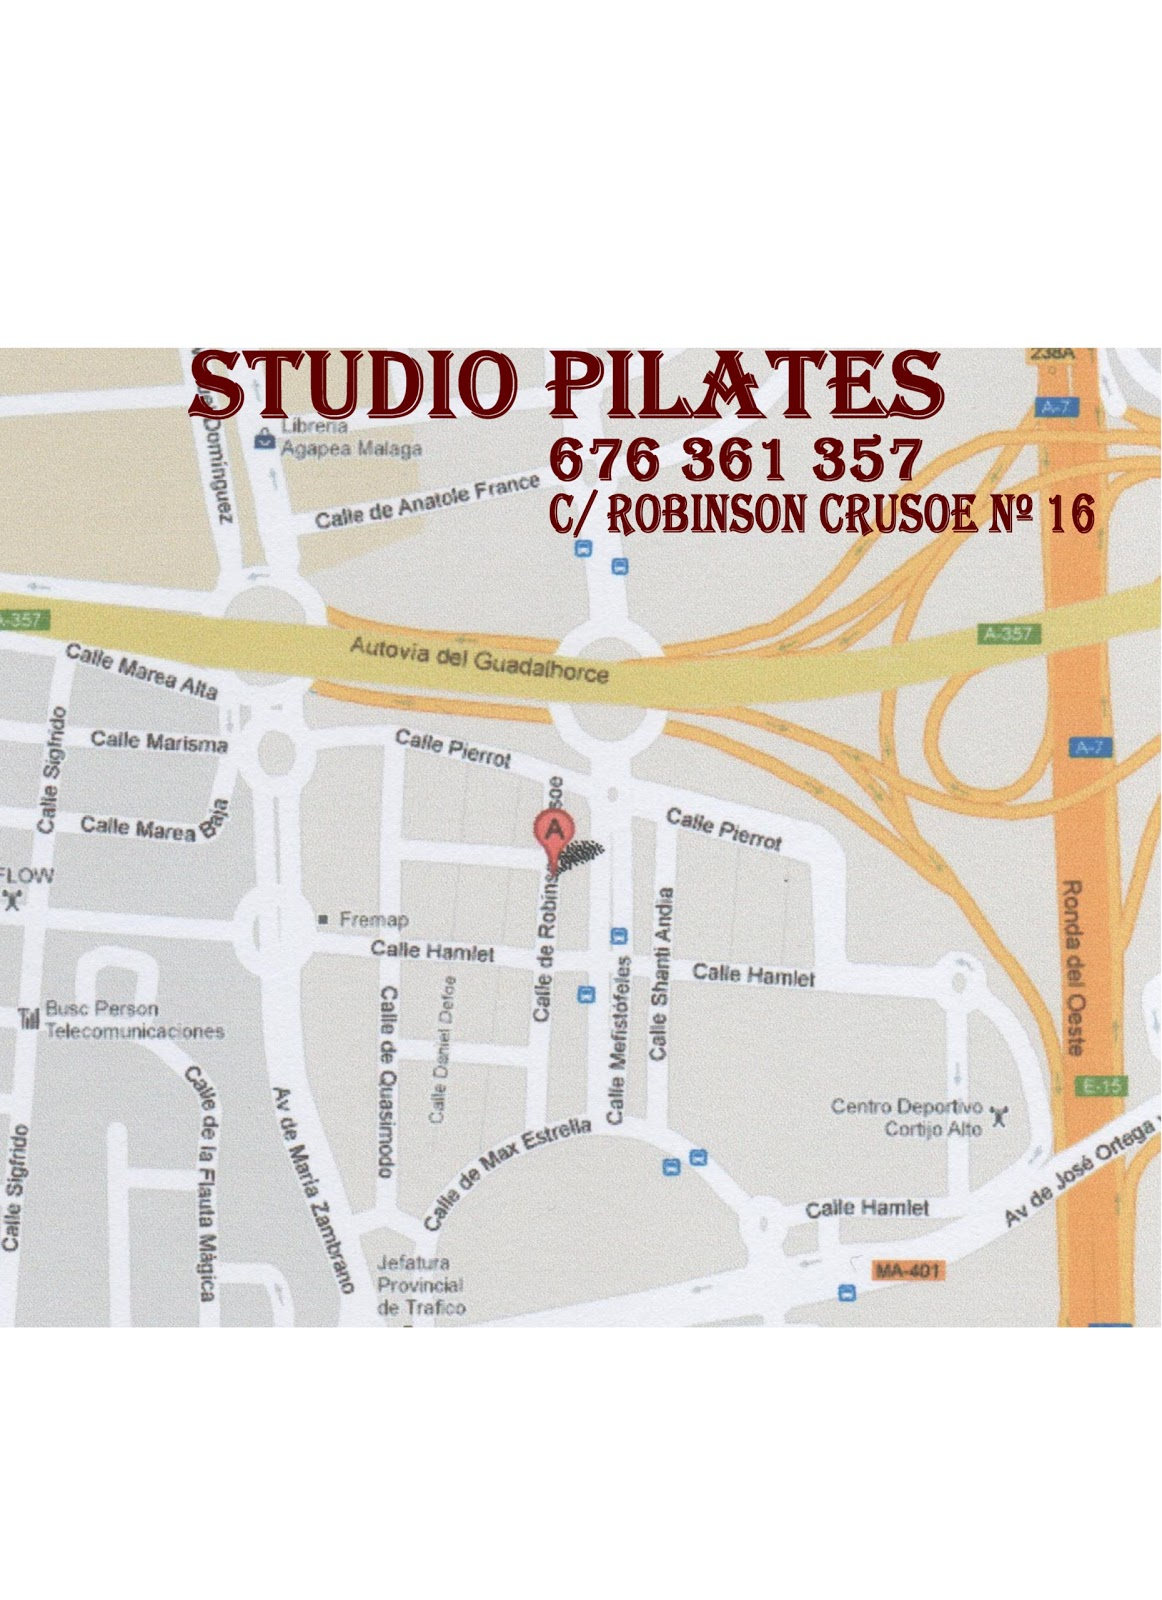 Bailas pilar olivares studio pilates teatinos m laga - Jefatura de trafico malaga ...